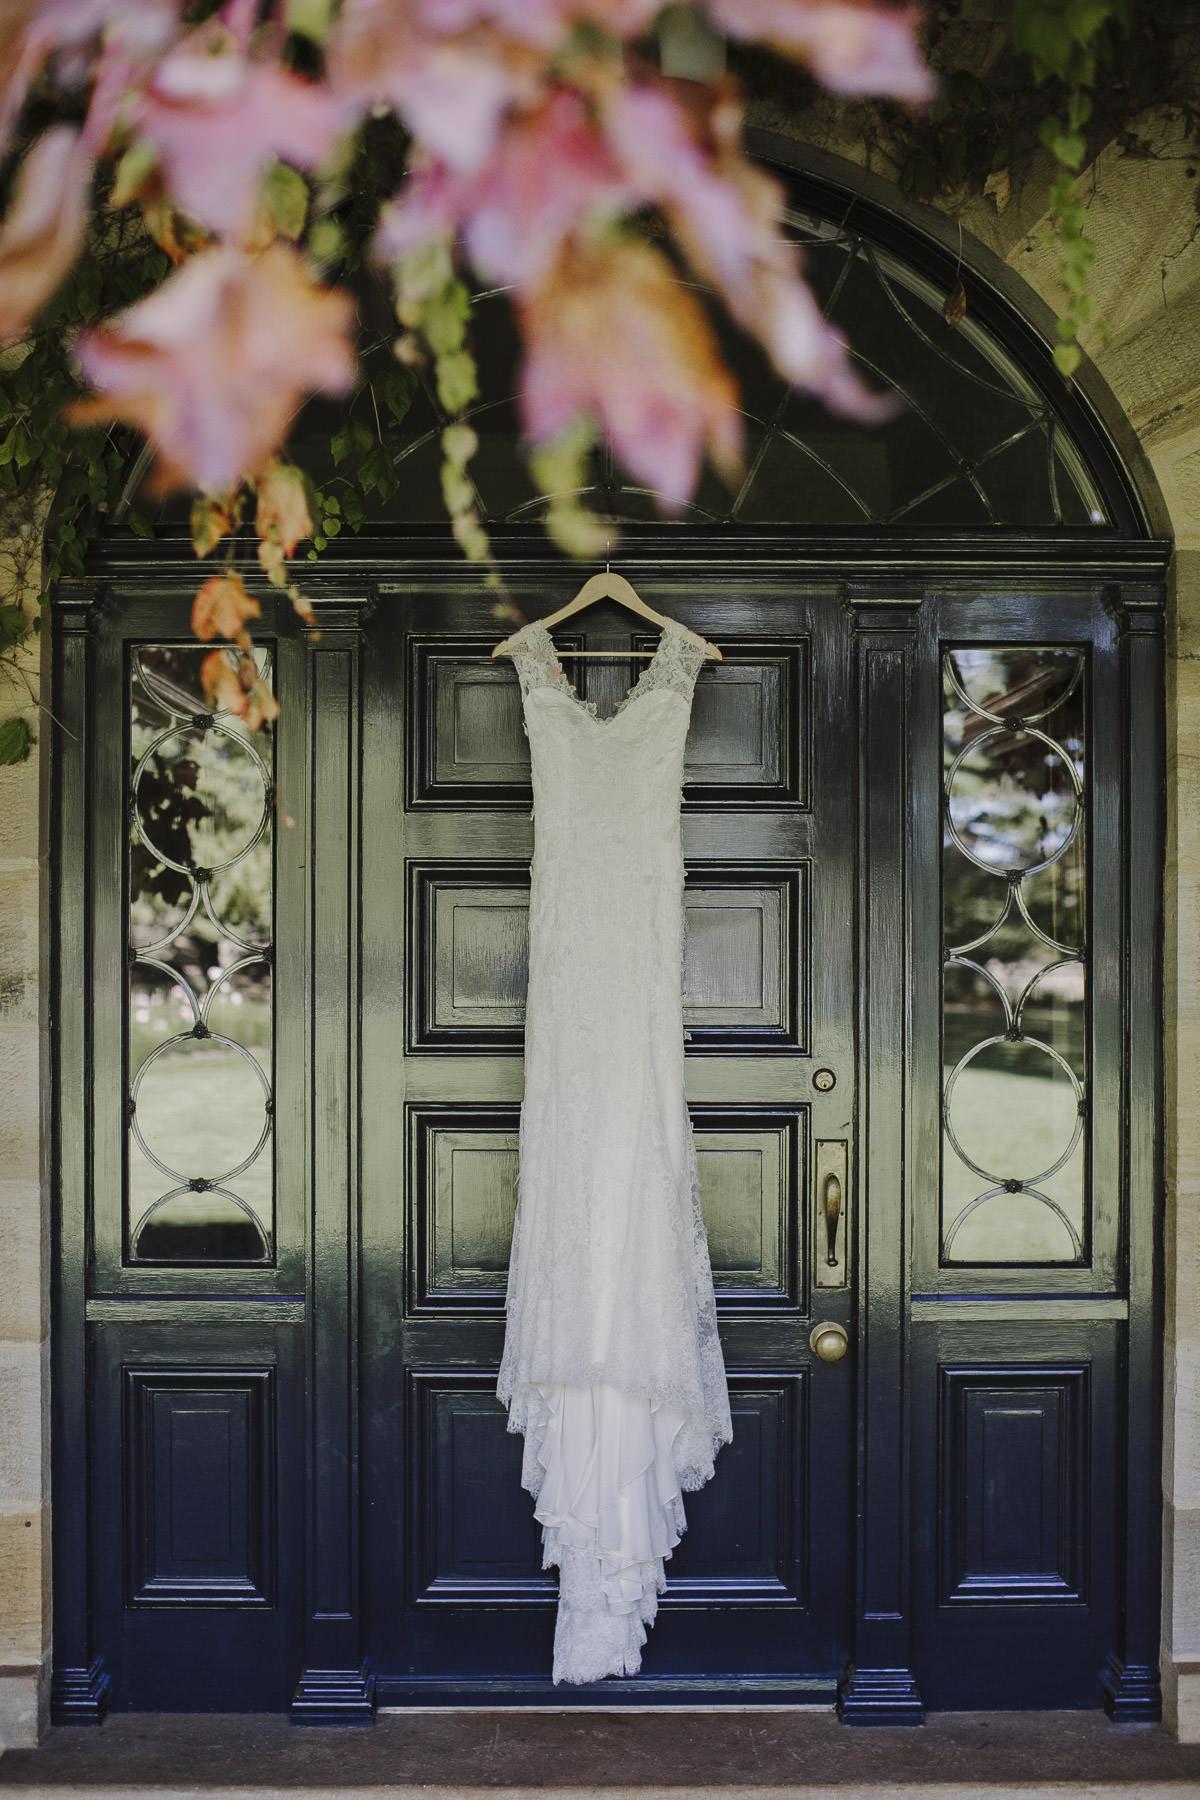 160506_justinaaron_wedding_holly_daniel_pr-33.jpg